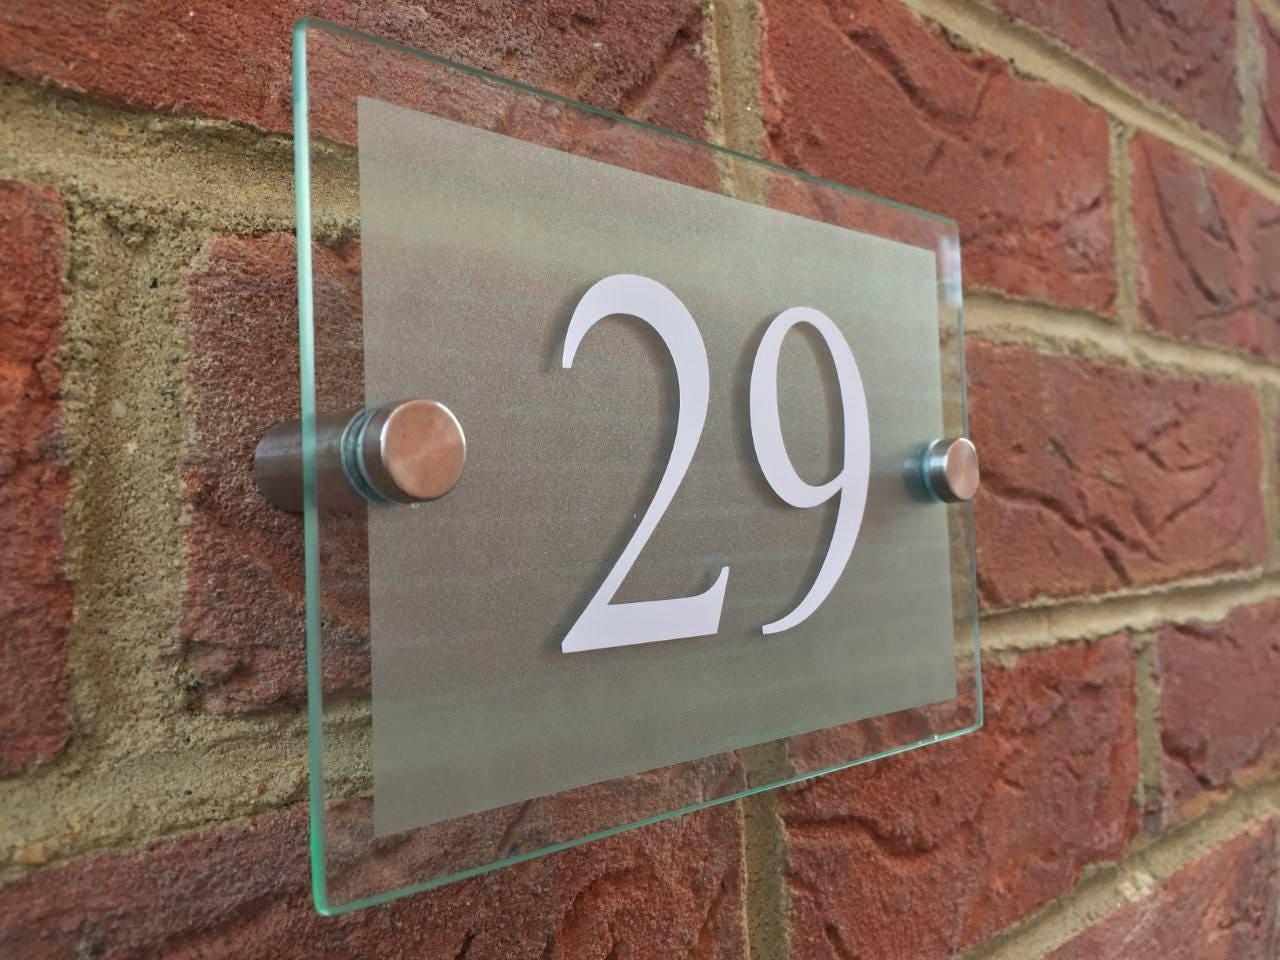 Moderna casa números vidrio acrílico casa signo puerta número